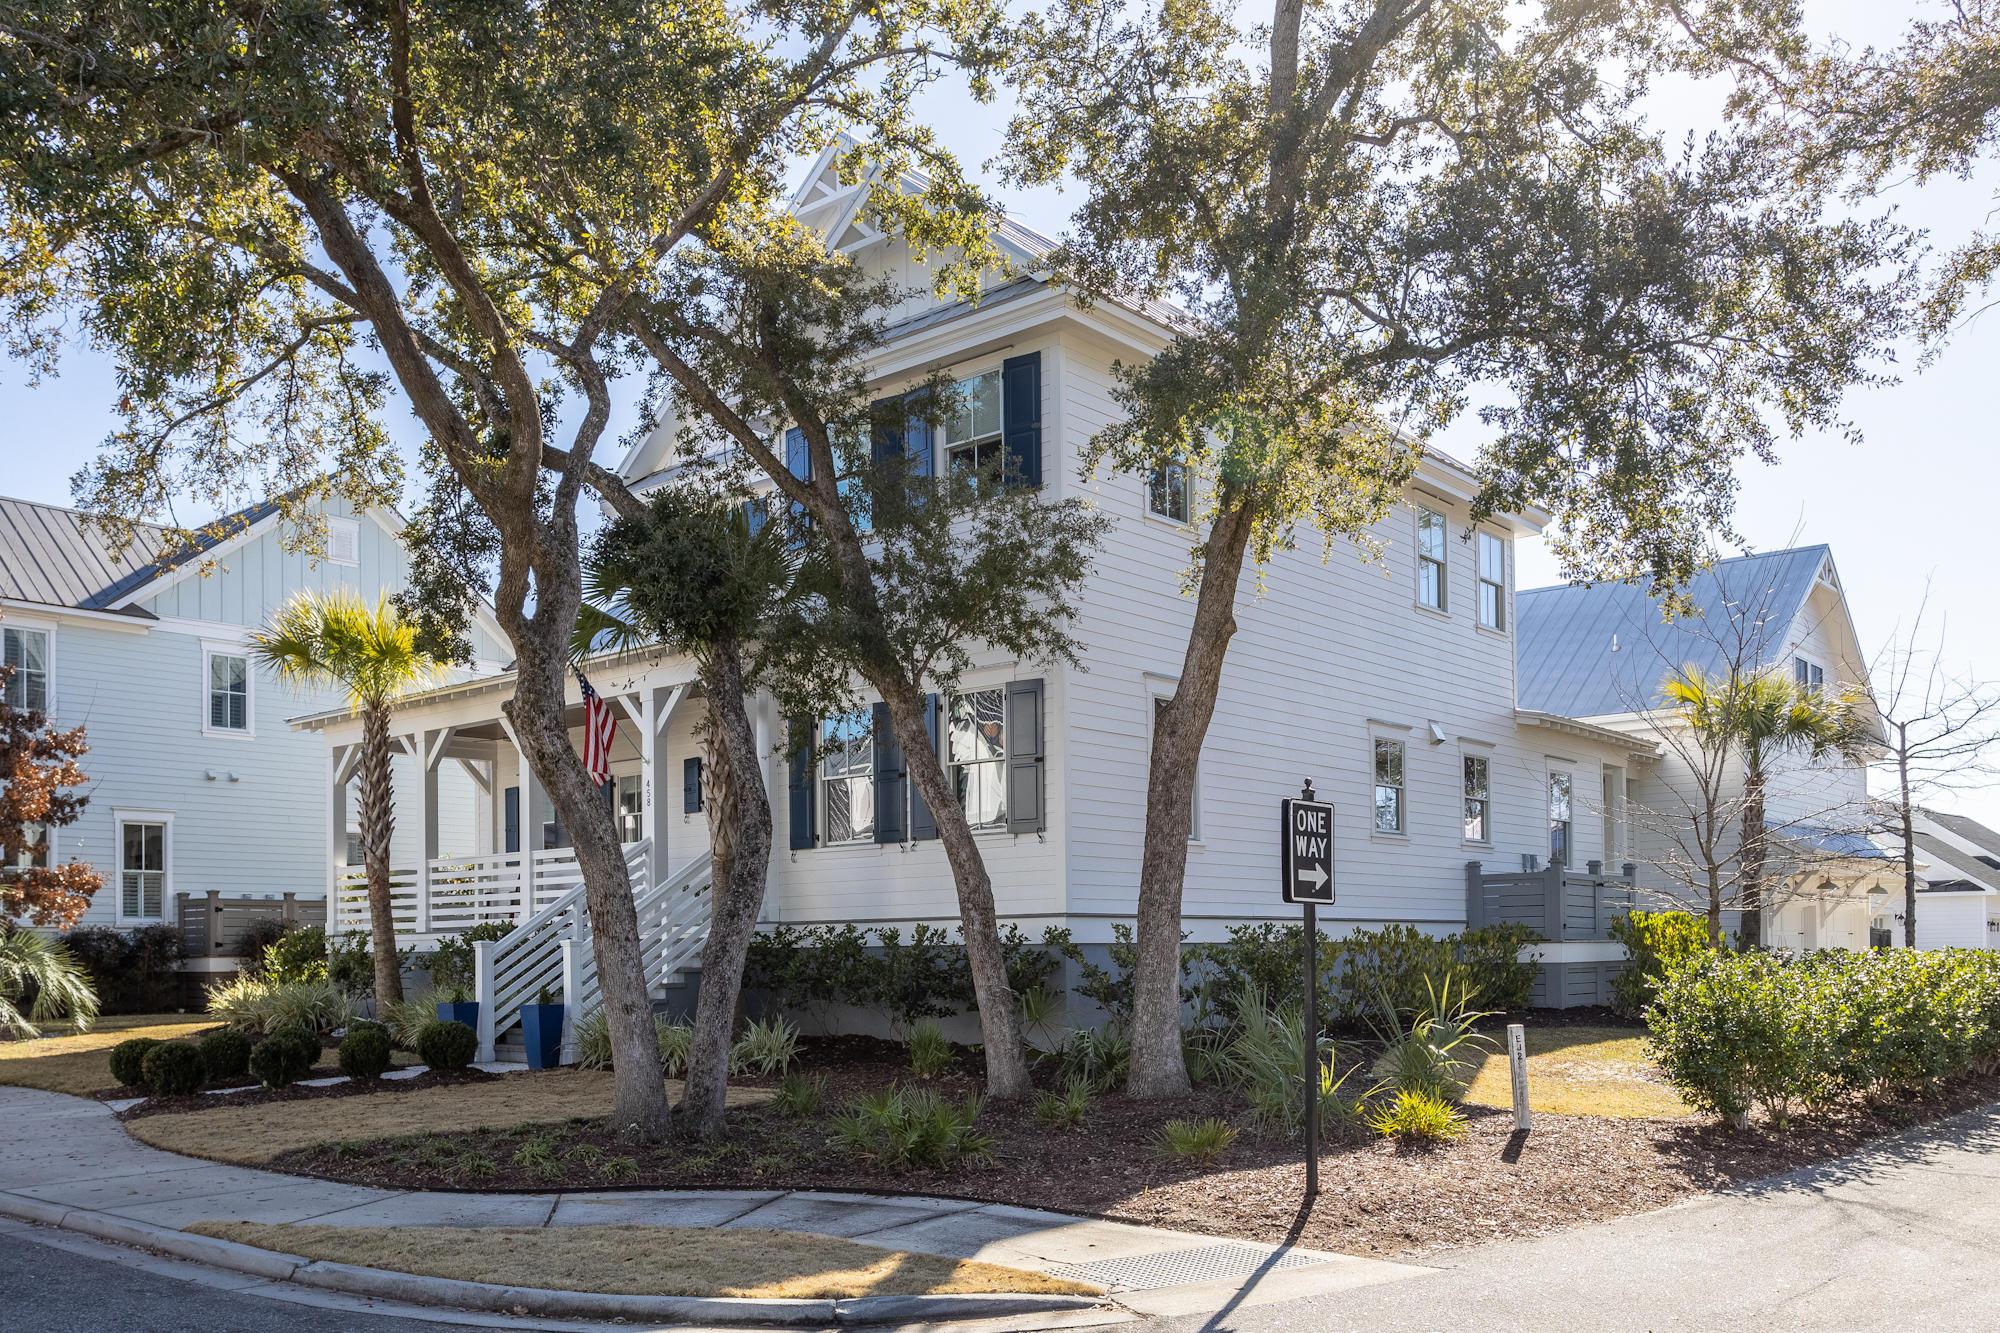 Daniel Island Park Homes For Sale - 458 Lesesne, Charleston, SC - 10